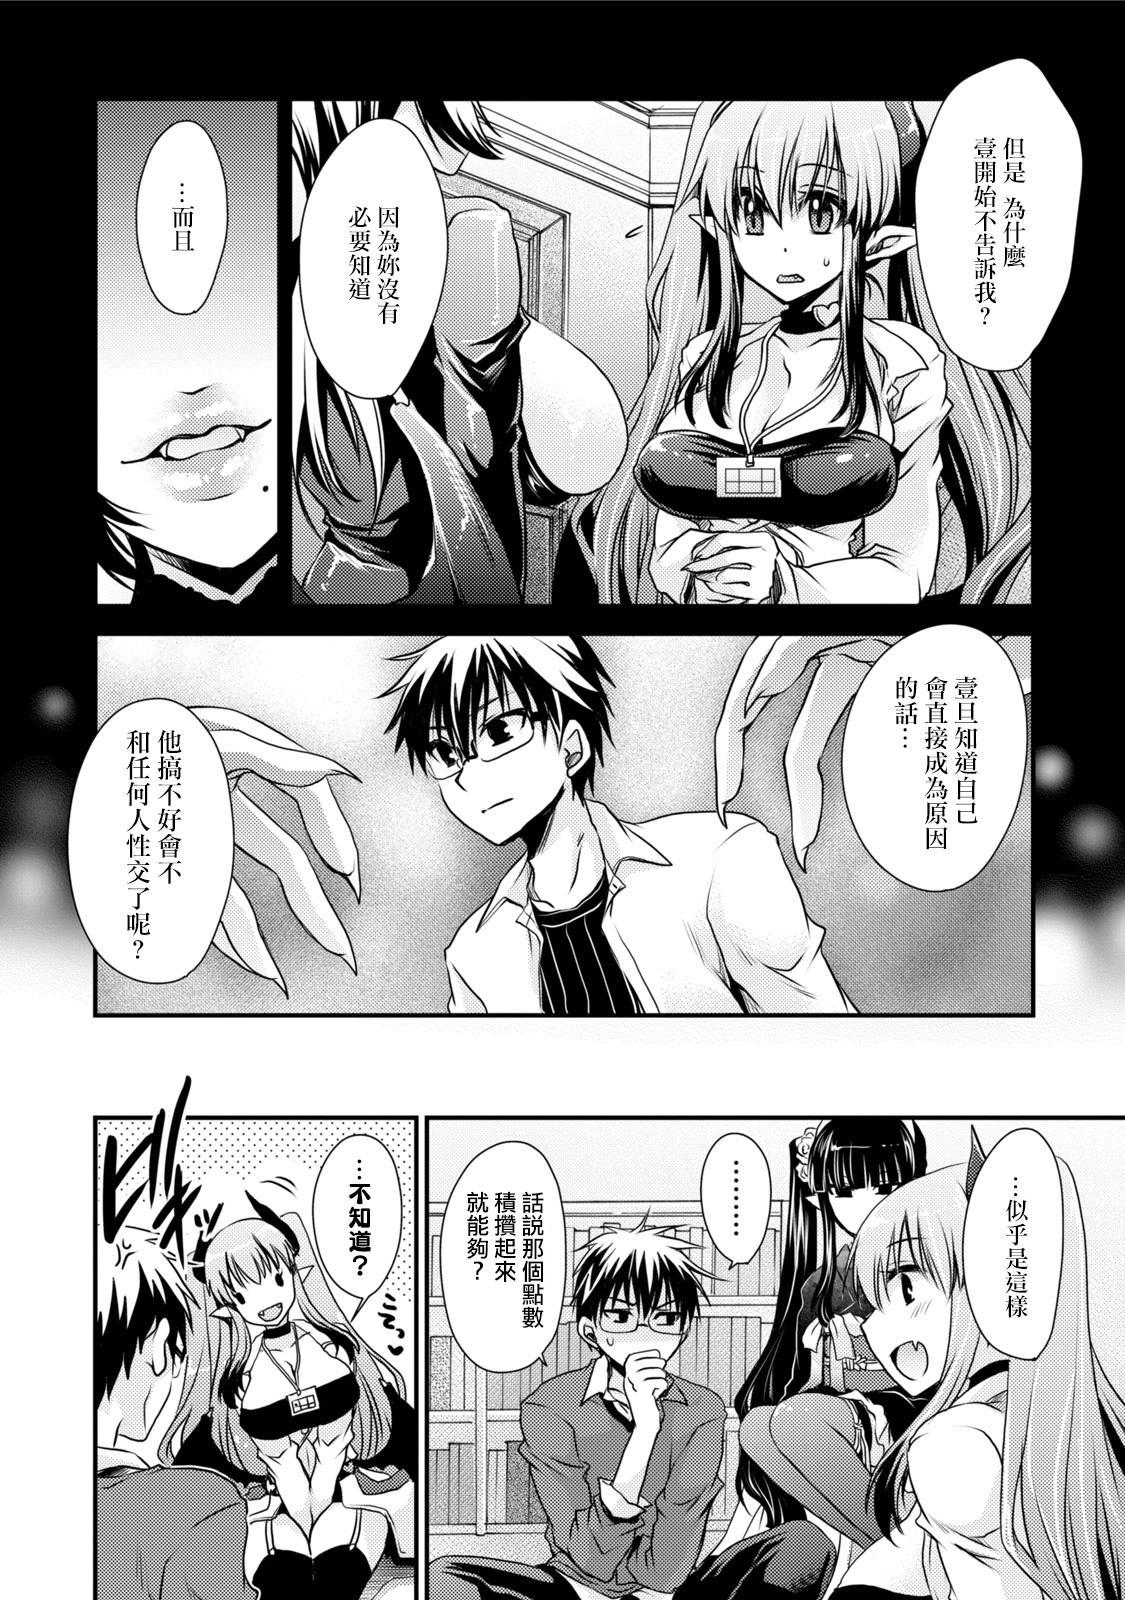 [Shinonome Ryu] Ore to Kanojo to Owaru Sekai - World's end LoveStory ch.1-9 [Chinese] [爱弹幕汉化组] [Digital] 137